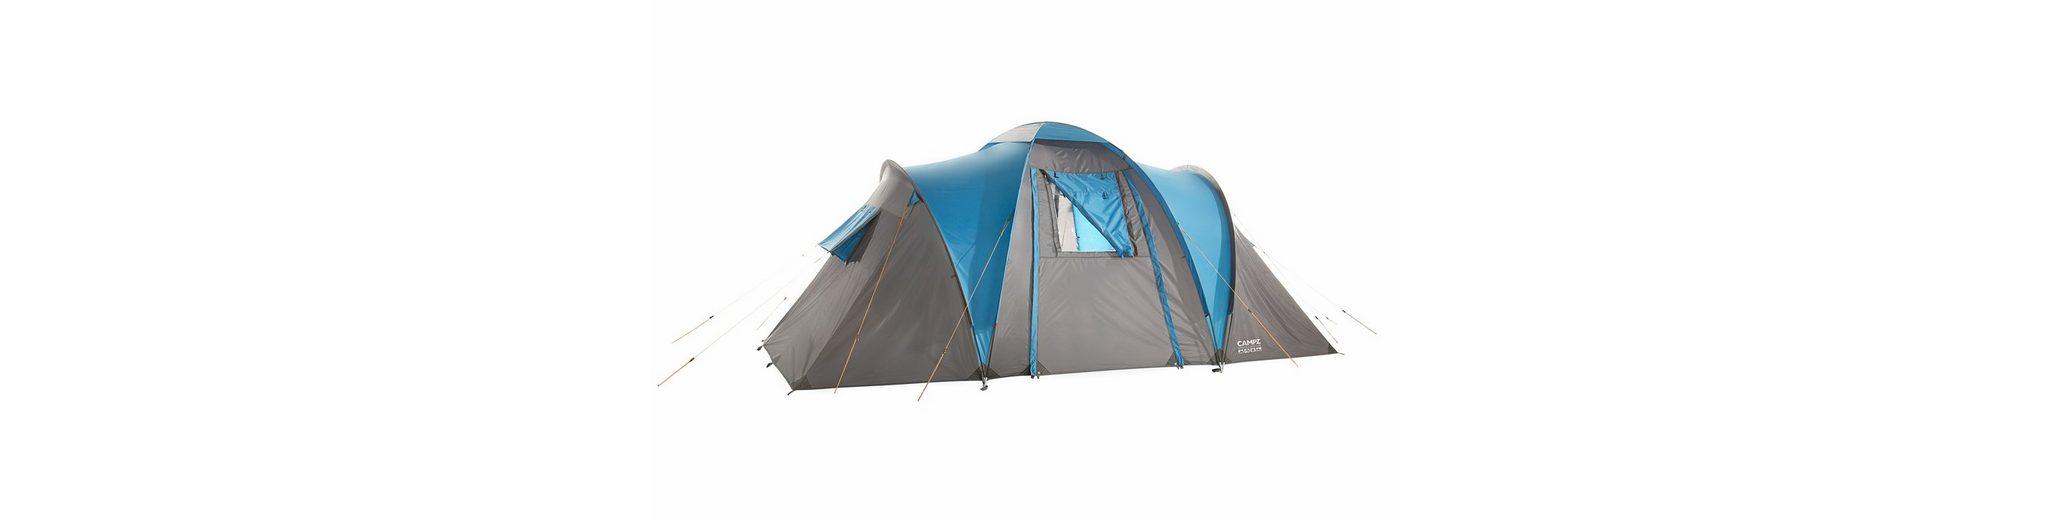 CAMPZ Zelt »Aquitaine Zelt 4P«